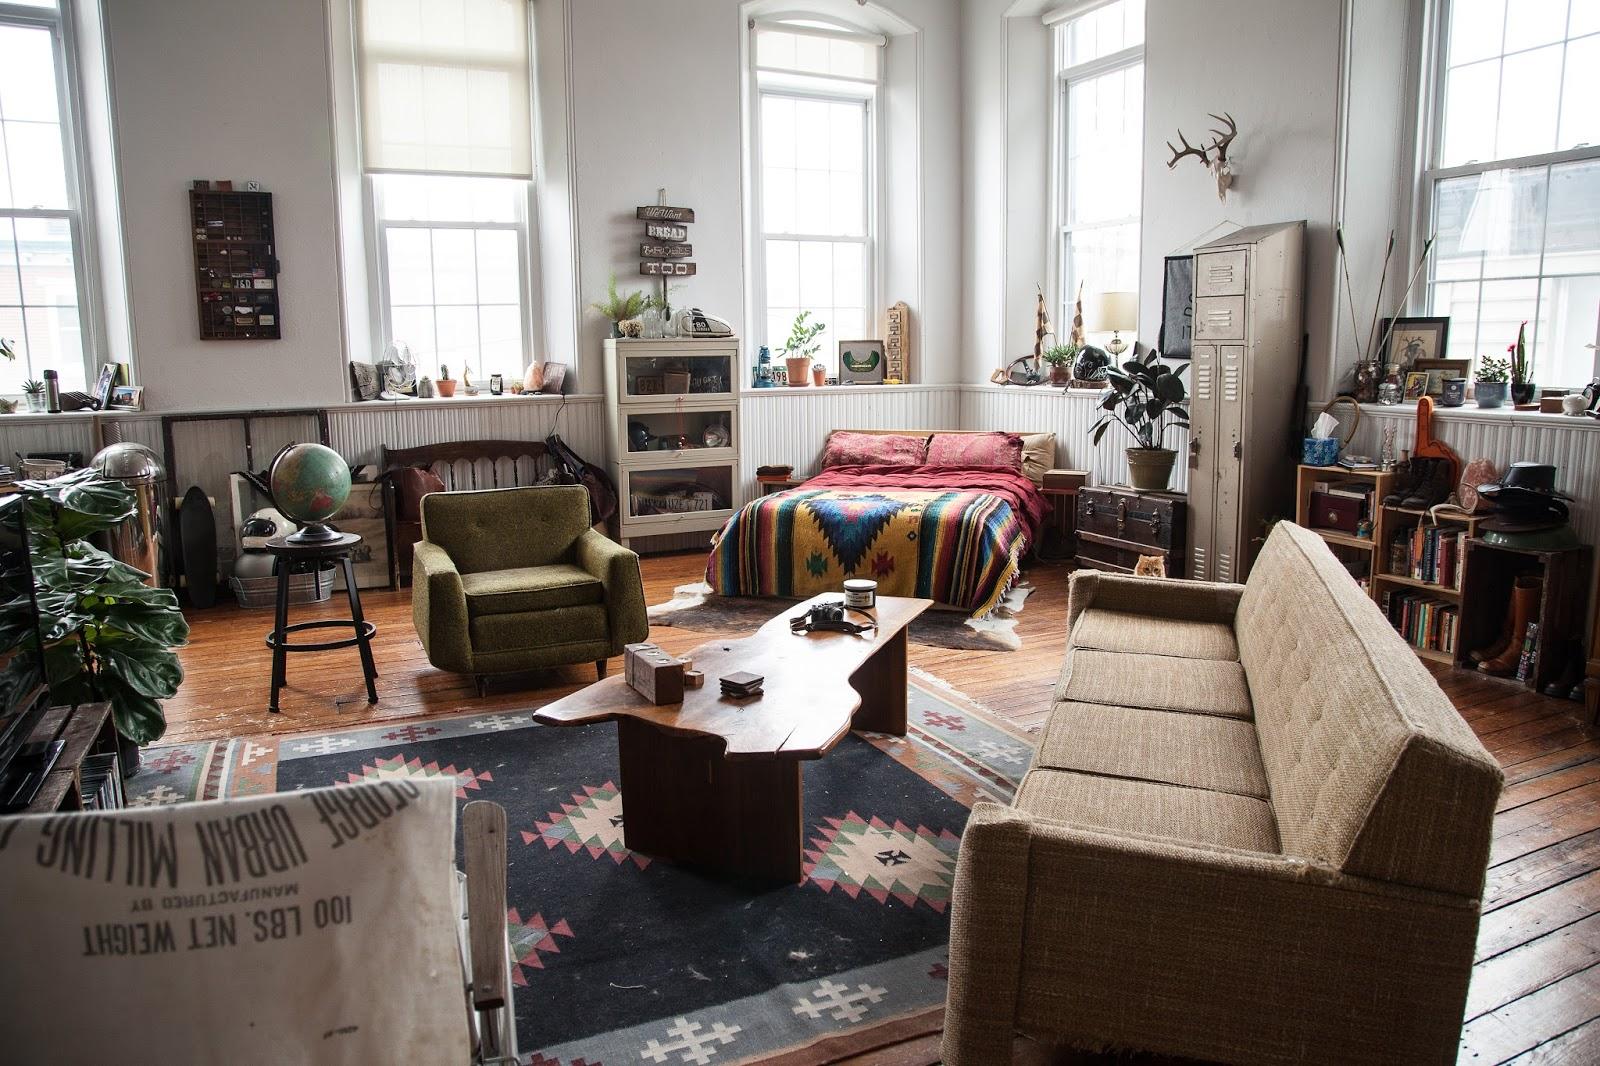 Fishtown Studio Living Room in a Former Church Rectory